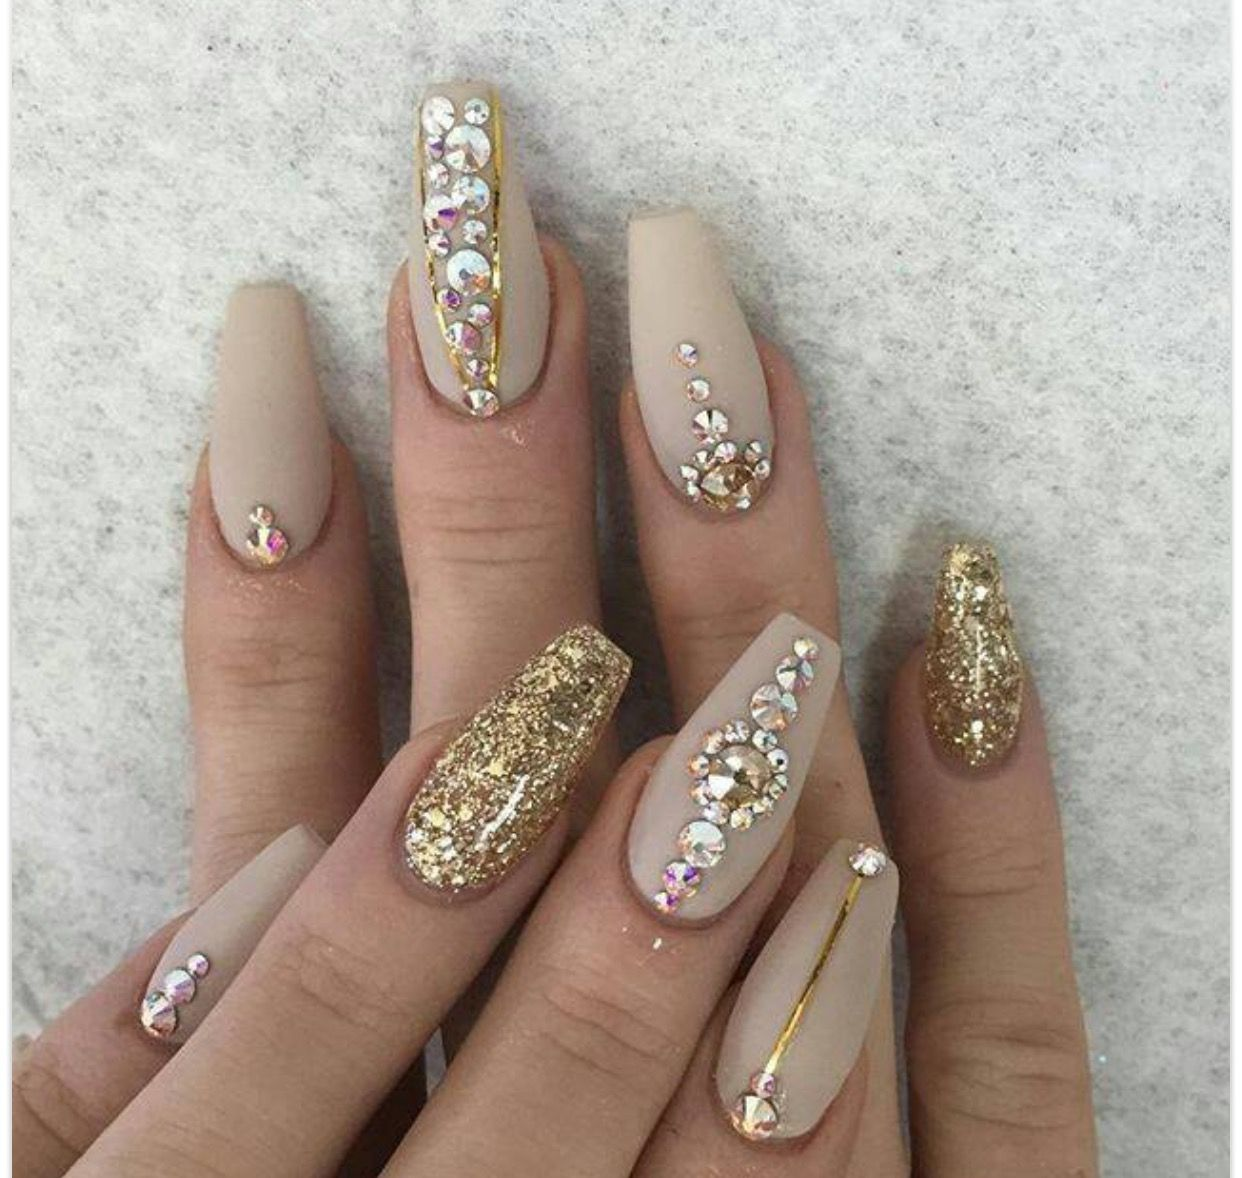 pinterest; 🌹🌙🌹   ▫ claws ▫   Pinterest   Minimalist nails ...